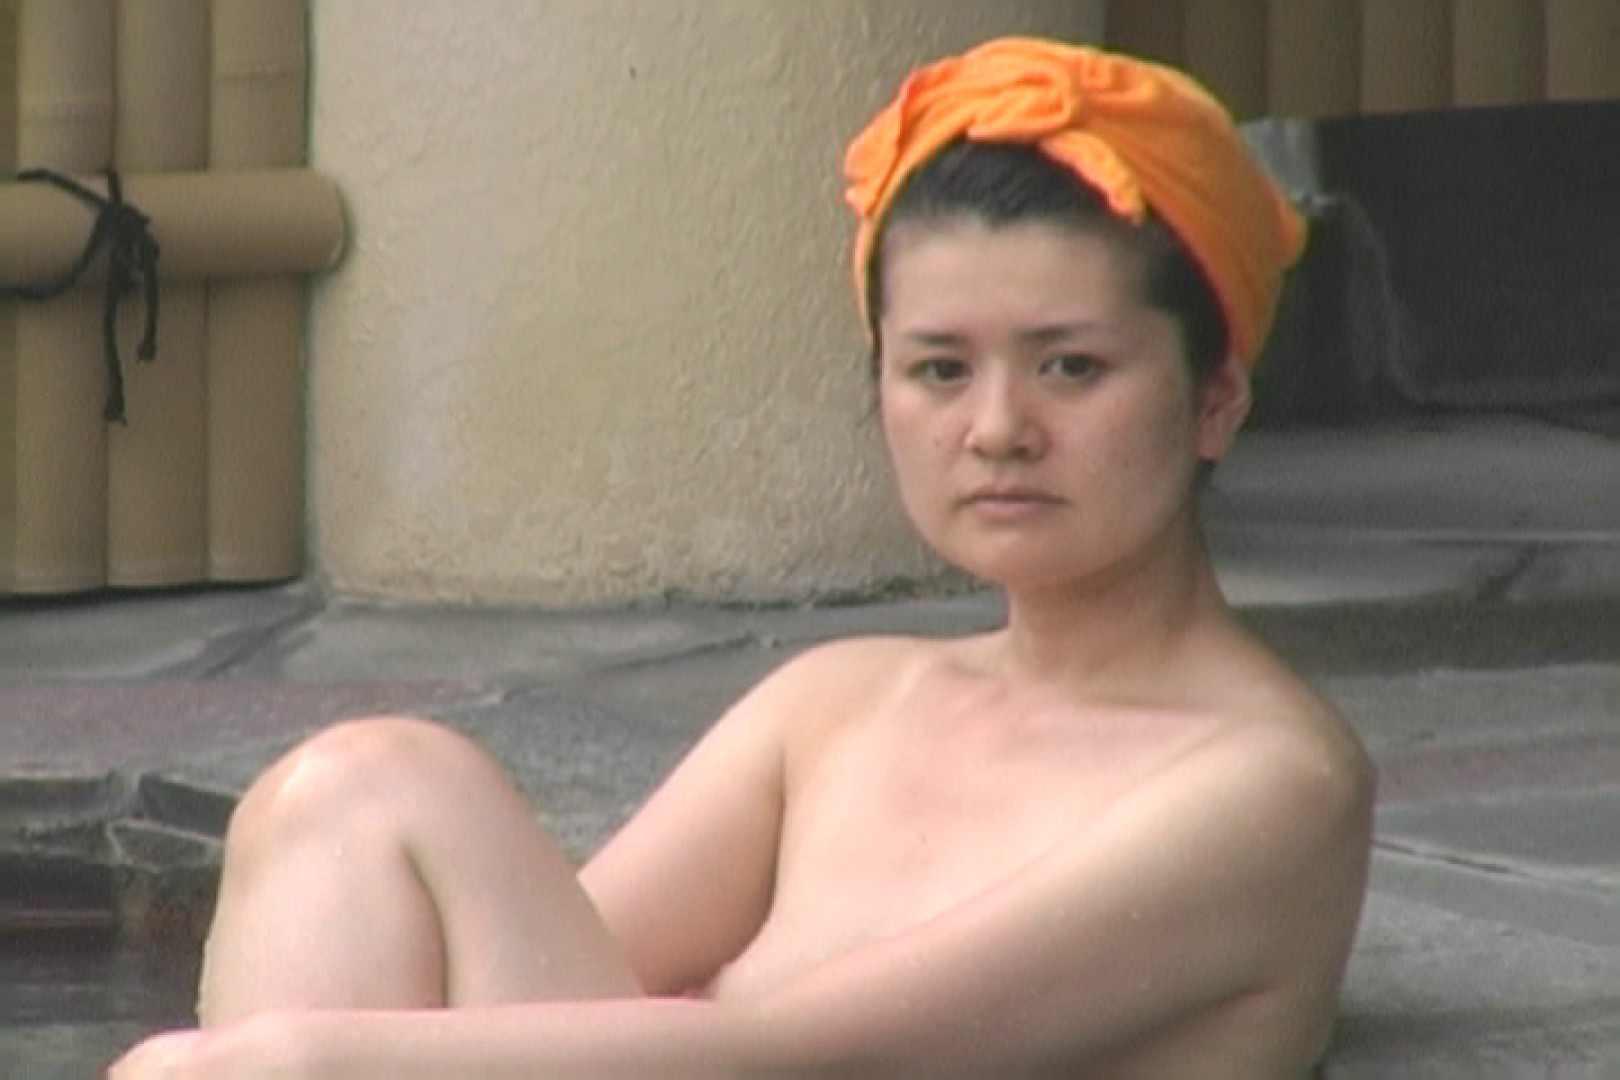 Aquaな露天風呂Vol.640 エッチな盗撮 セックス画像 101pic 30